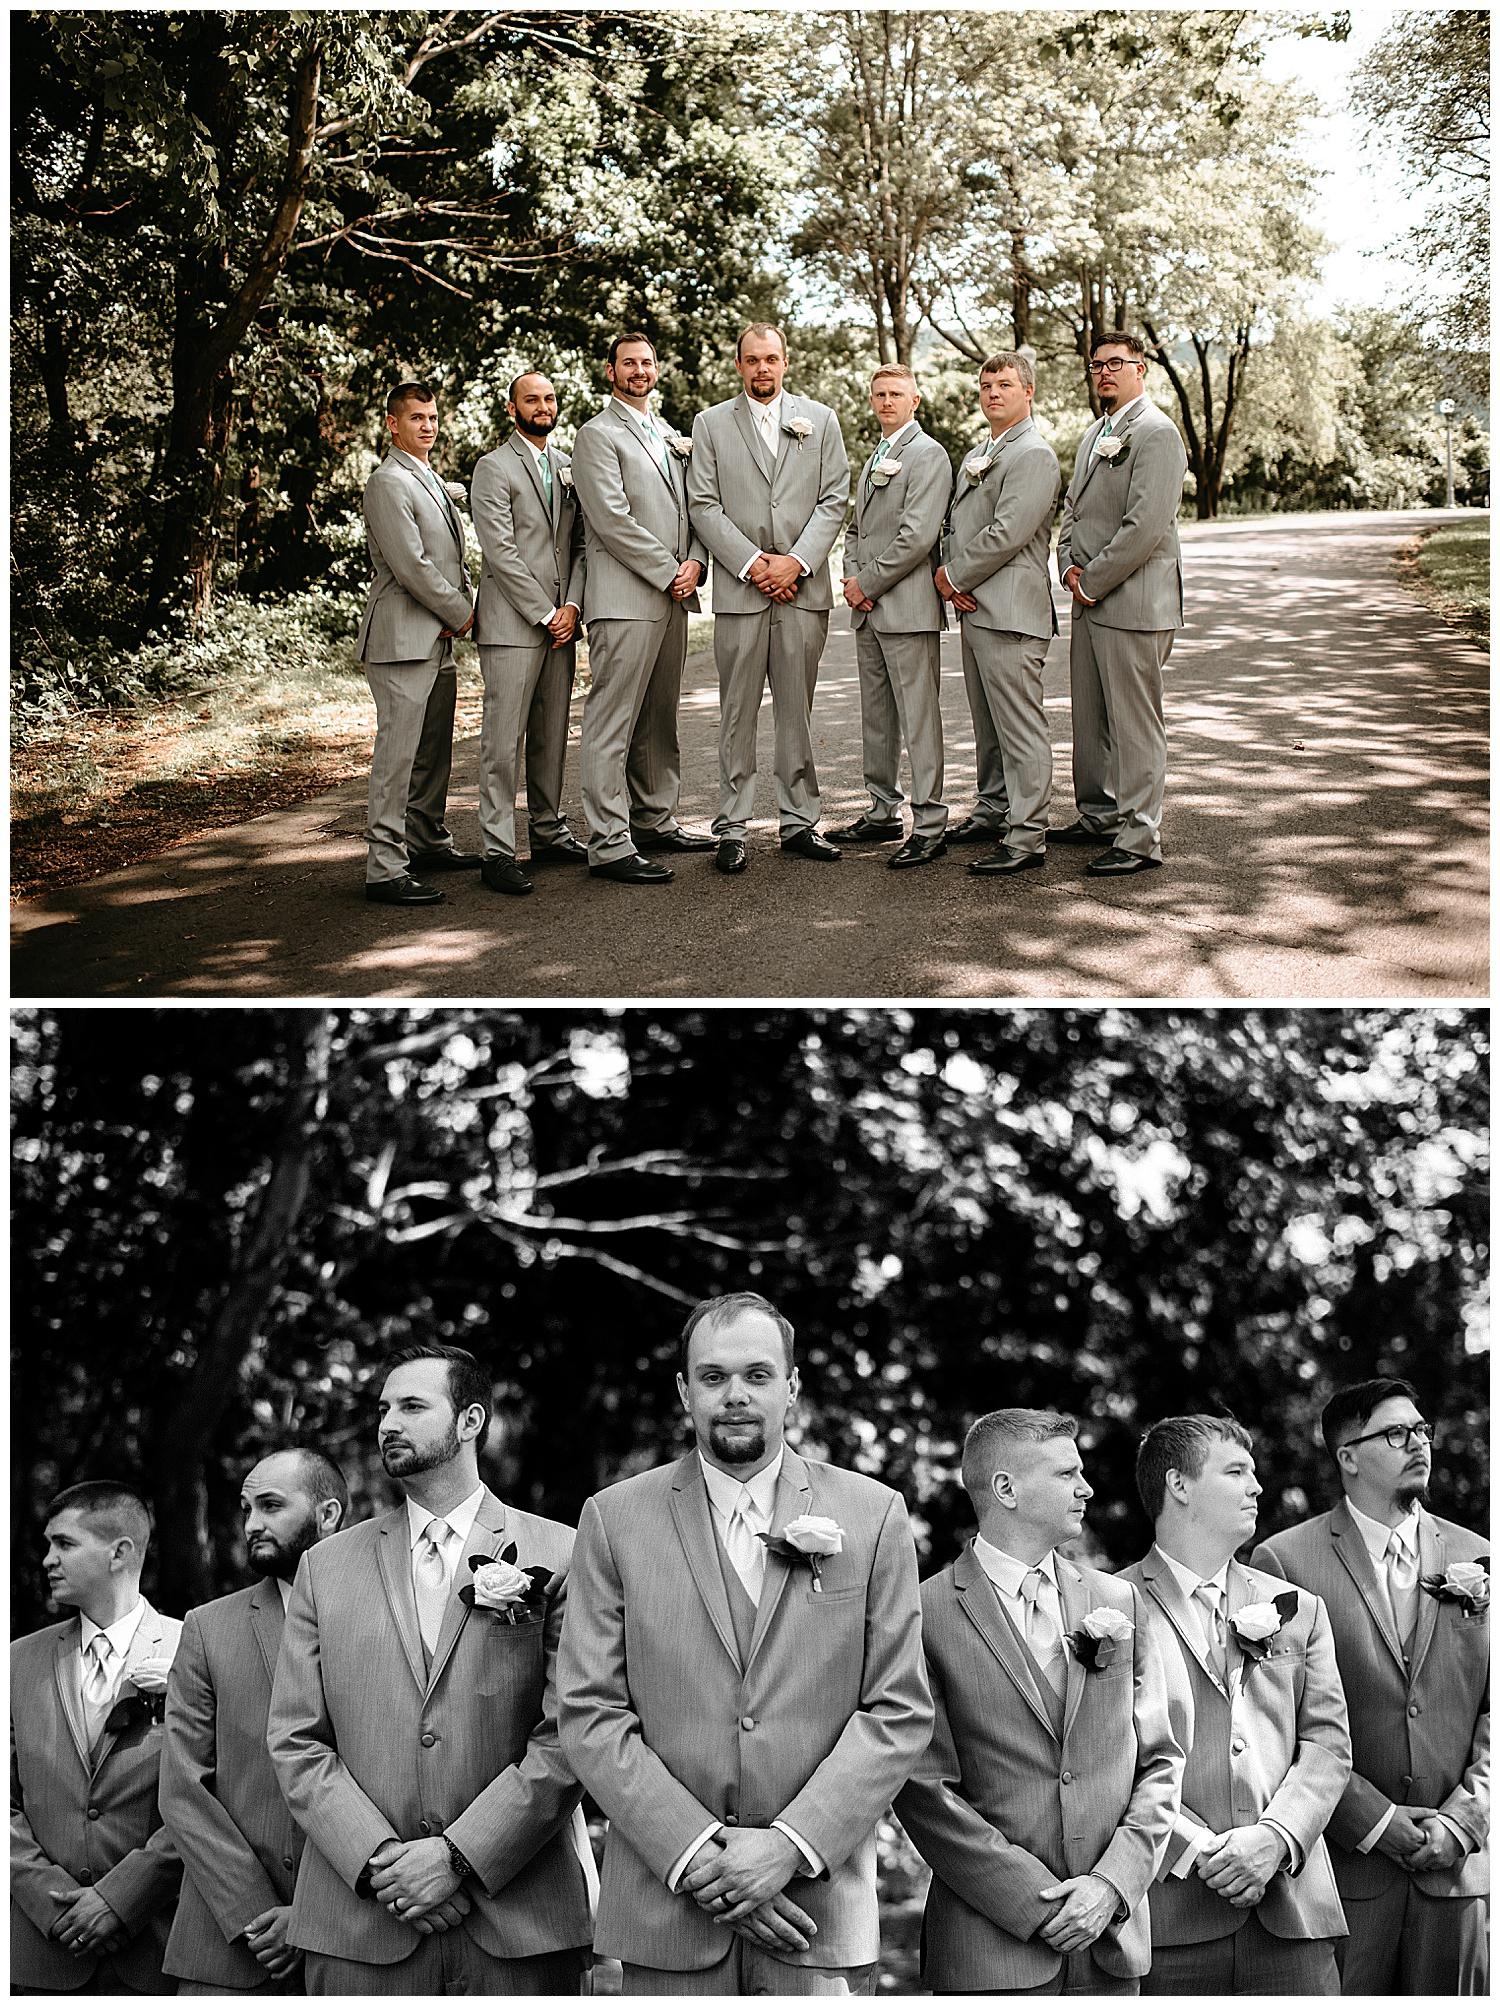 NEPA-Lehigh-Valley-Wedding-Photographer-at-Fountain-Springs-Country-Inn-Ashland-PA_0038.jpg